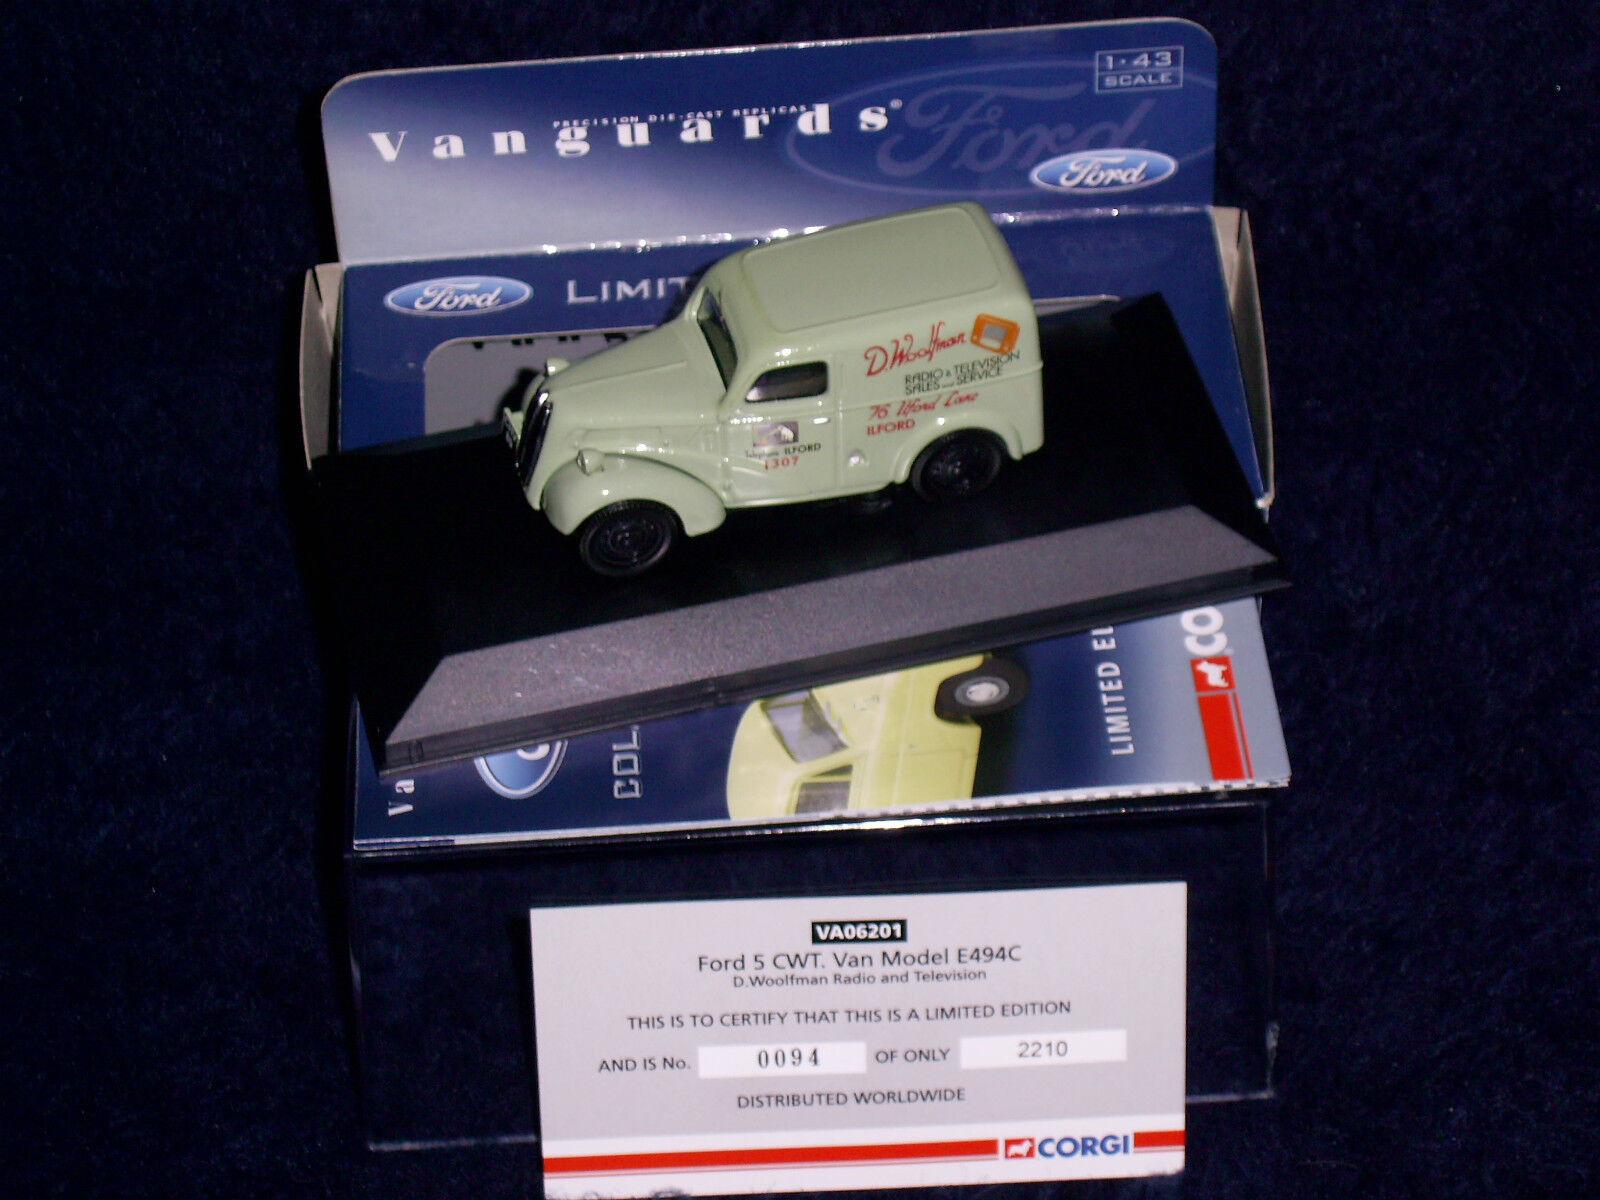 VA06201 CORGI/HORNBY Vanguards Ford Ford Ford 5 CWT Van modèle E494C dwoolfFemme Radio/tvnew. | Matière Choisie  6ed990